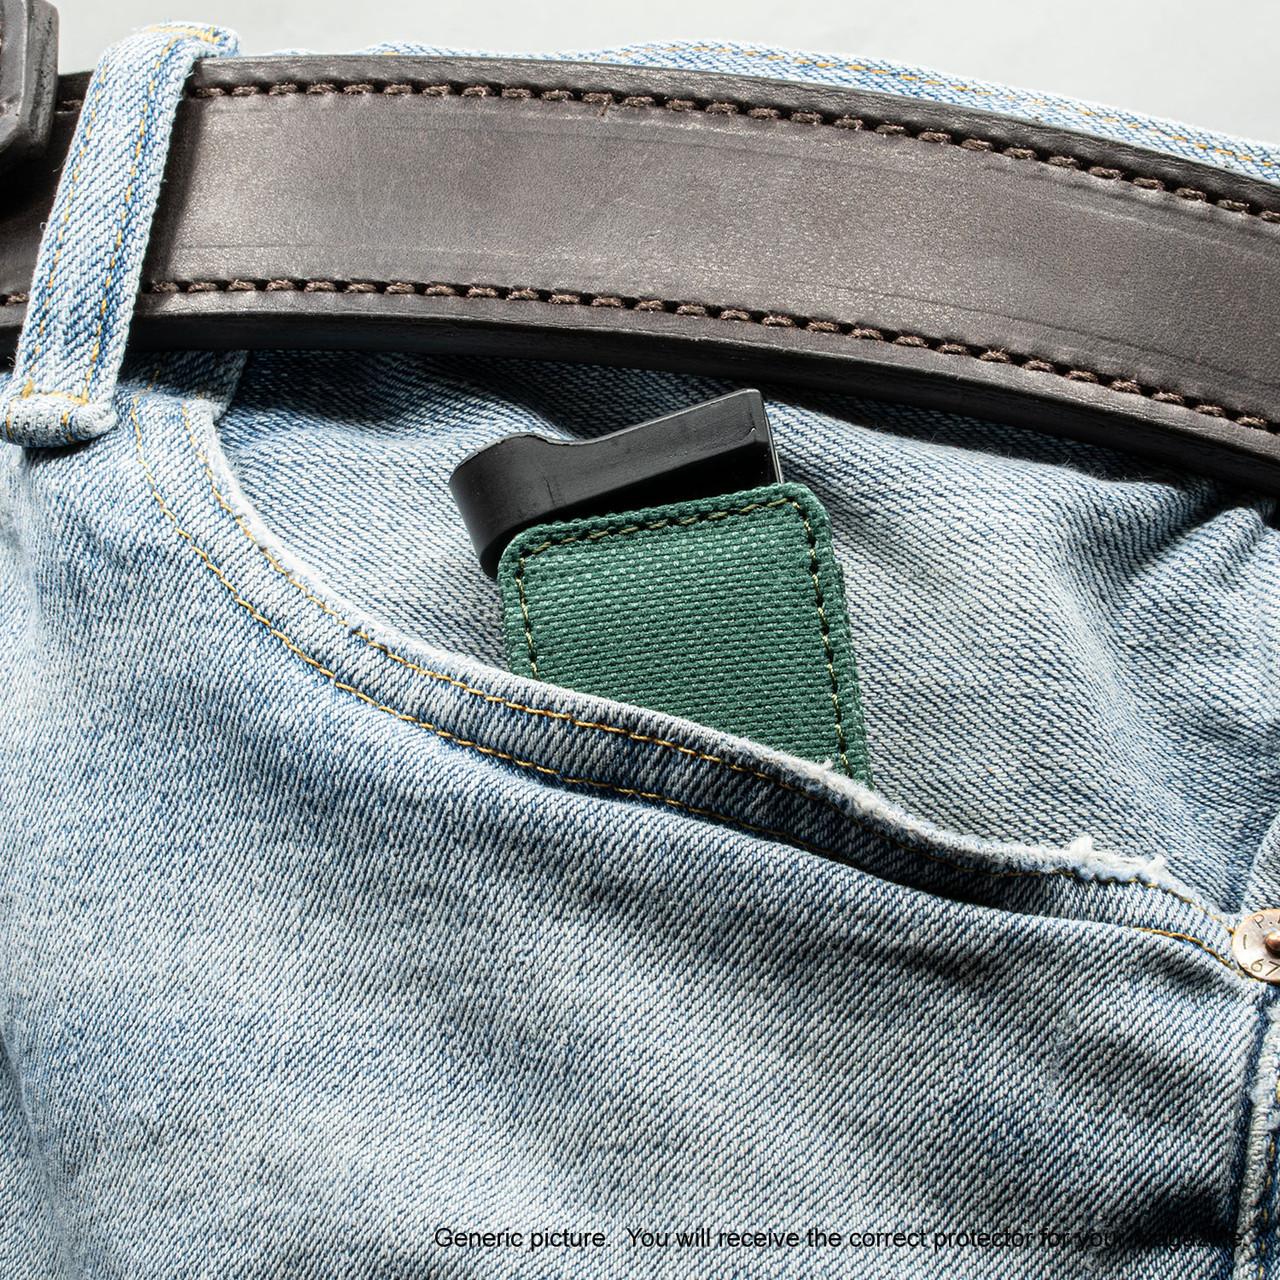 CZ 2075 Rami Green Covert Magazine Pocket Protector